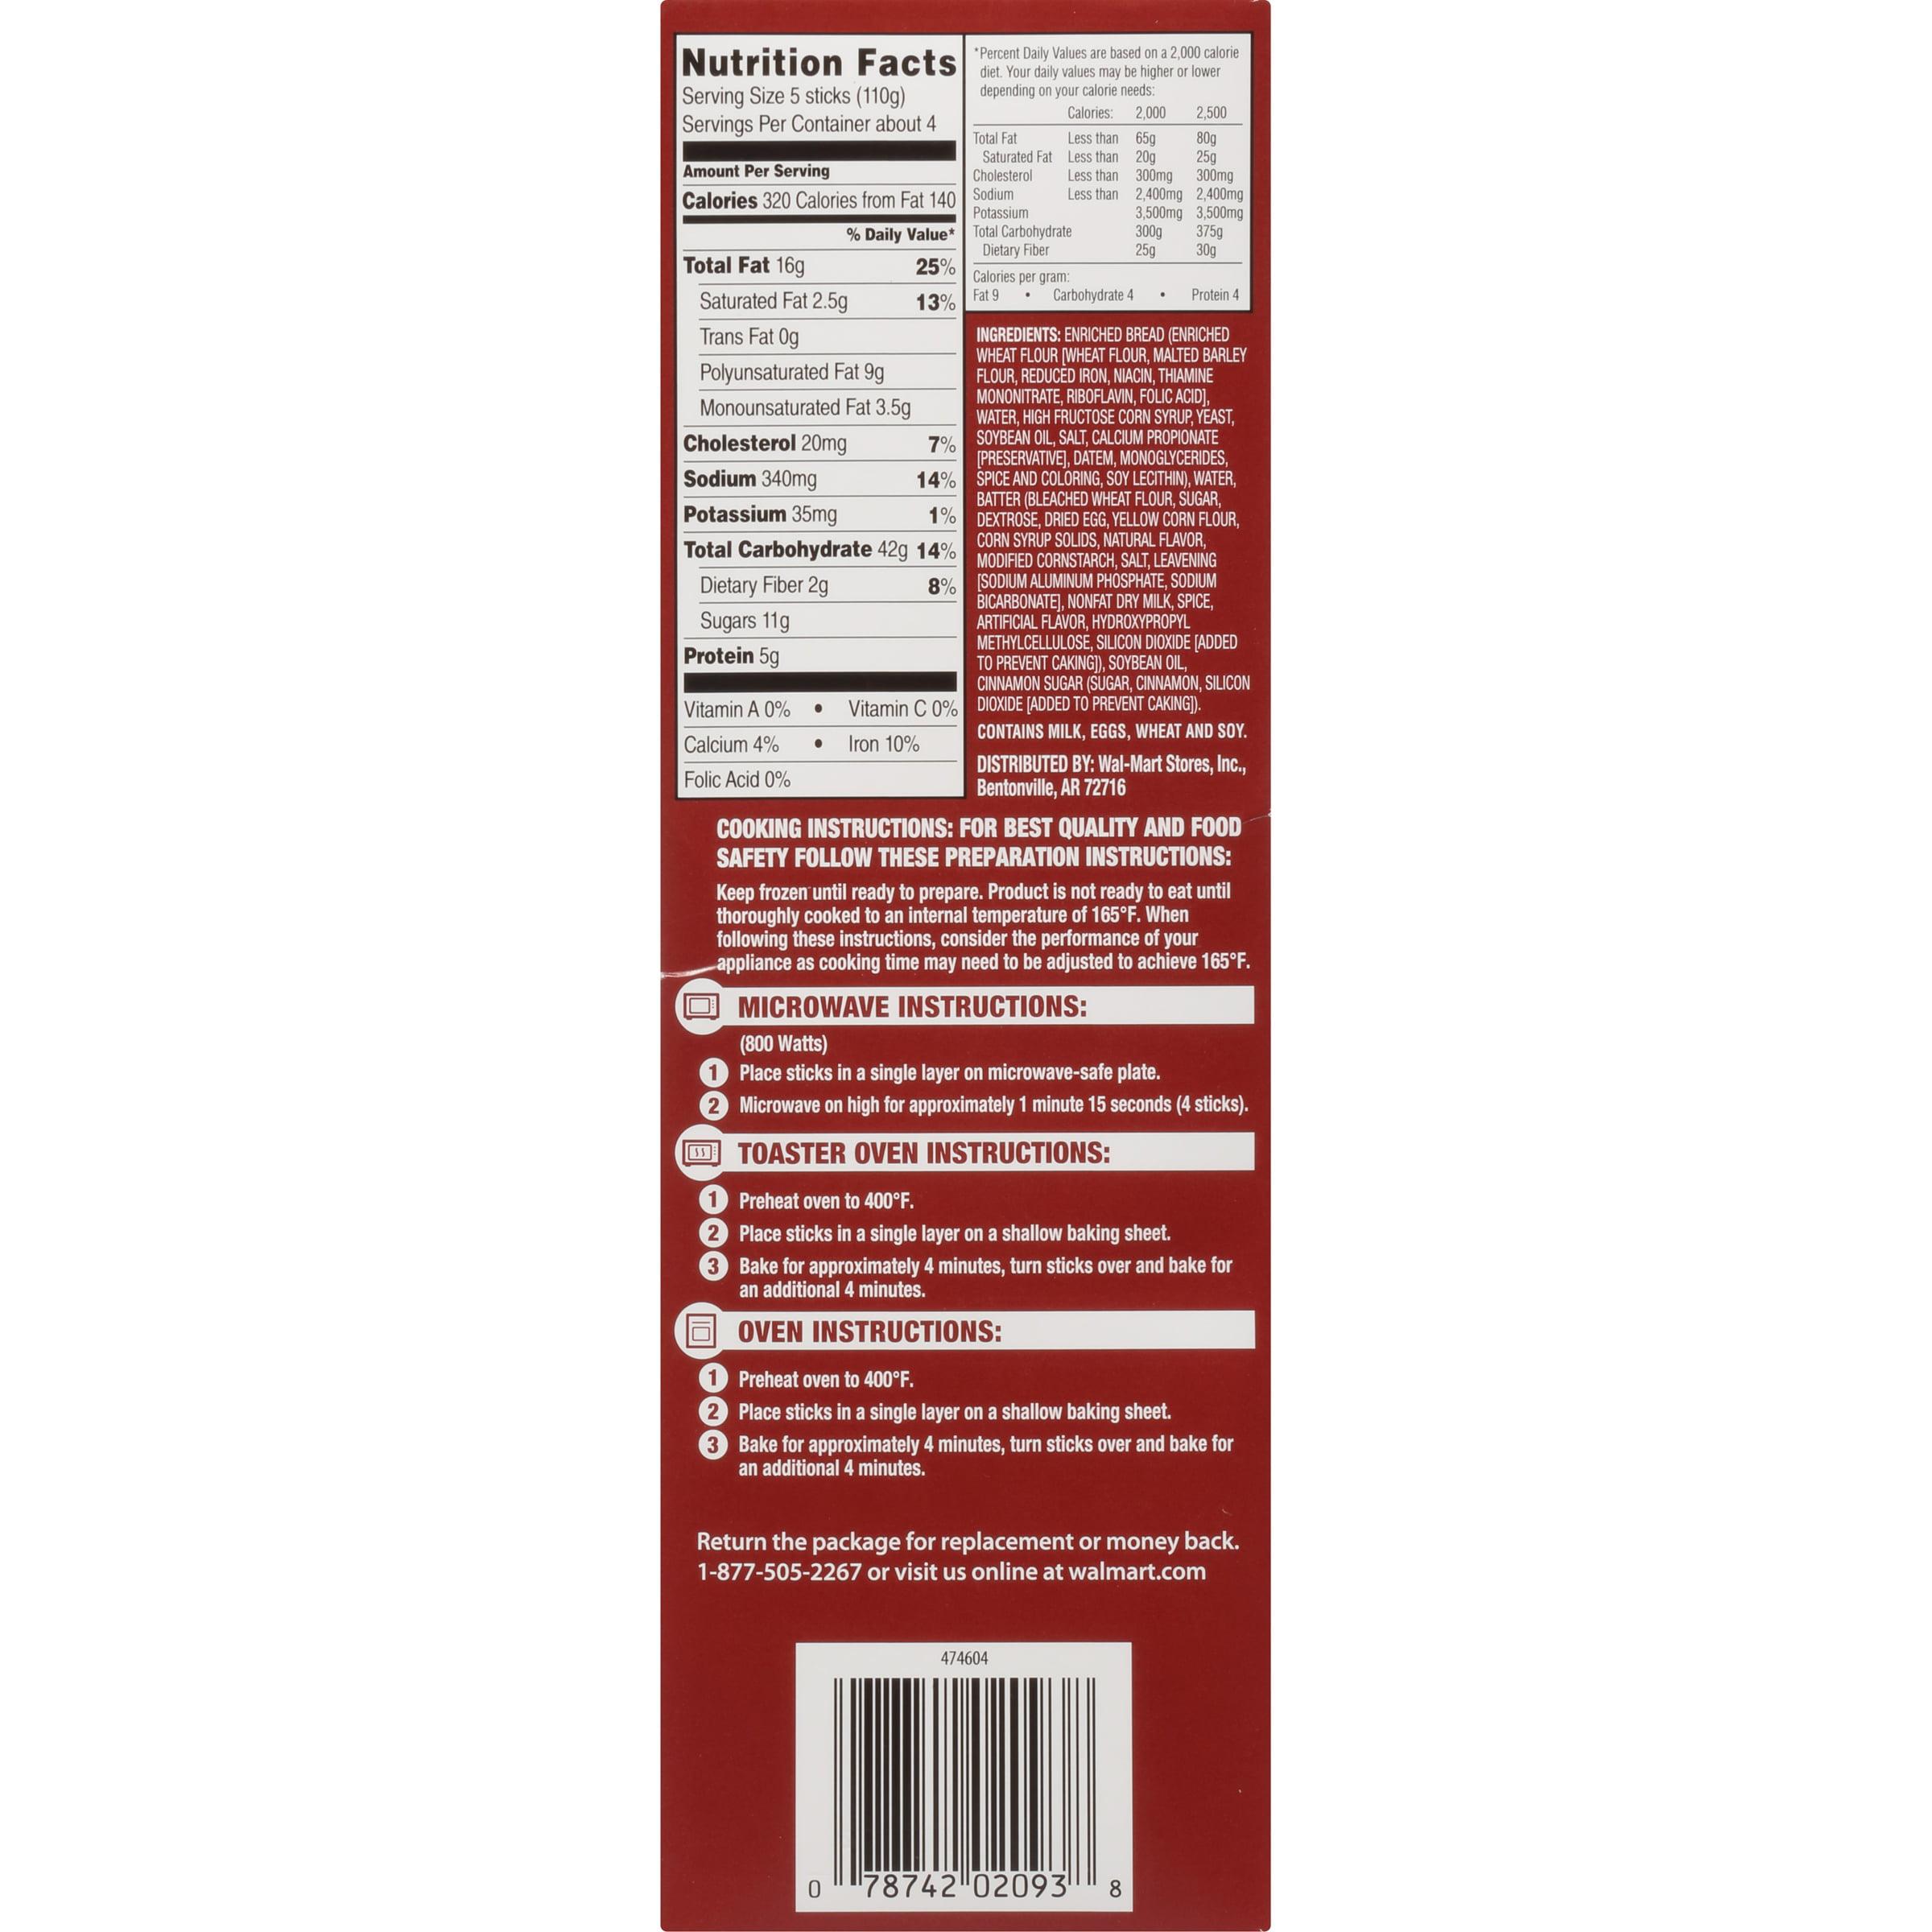 Great Value Cinnamon French Toast Sticks 16 Oz Box